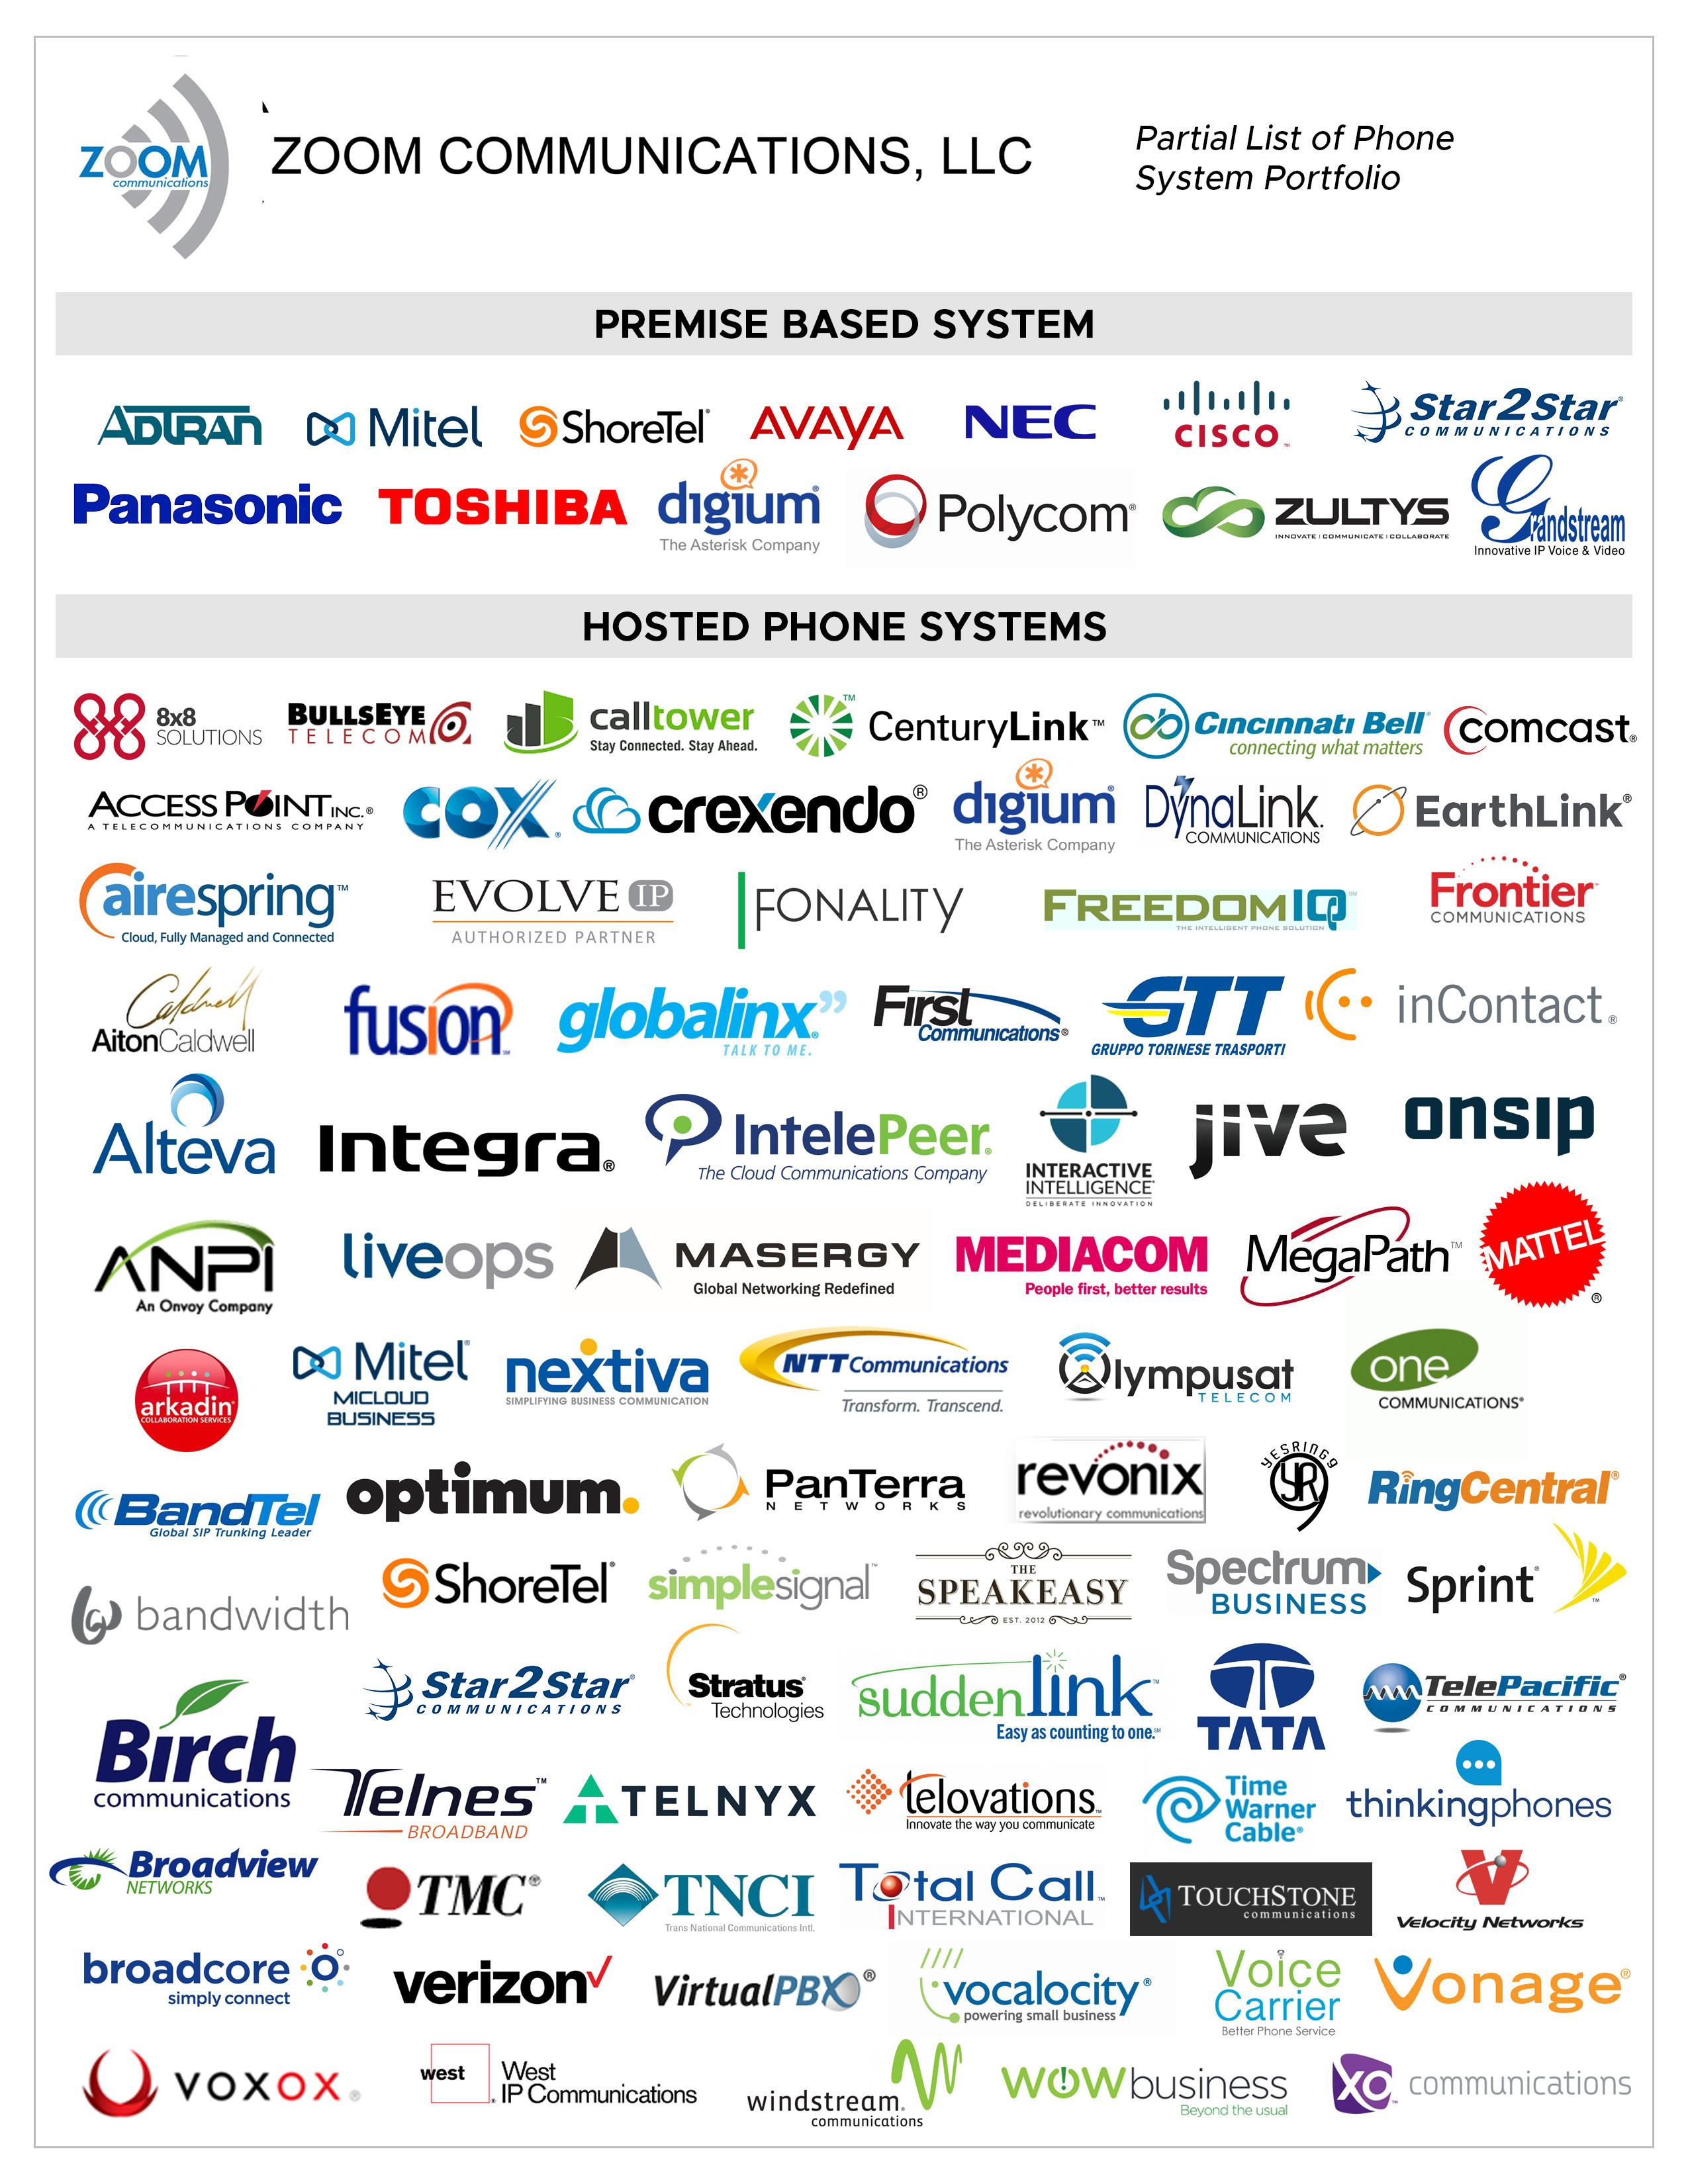 Phone System Flyer